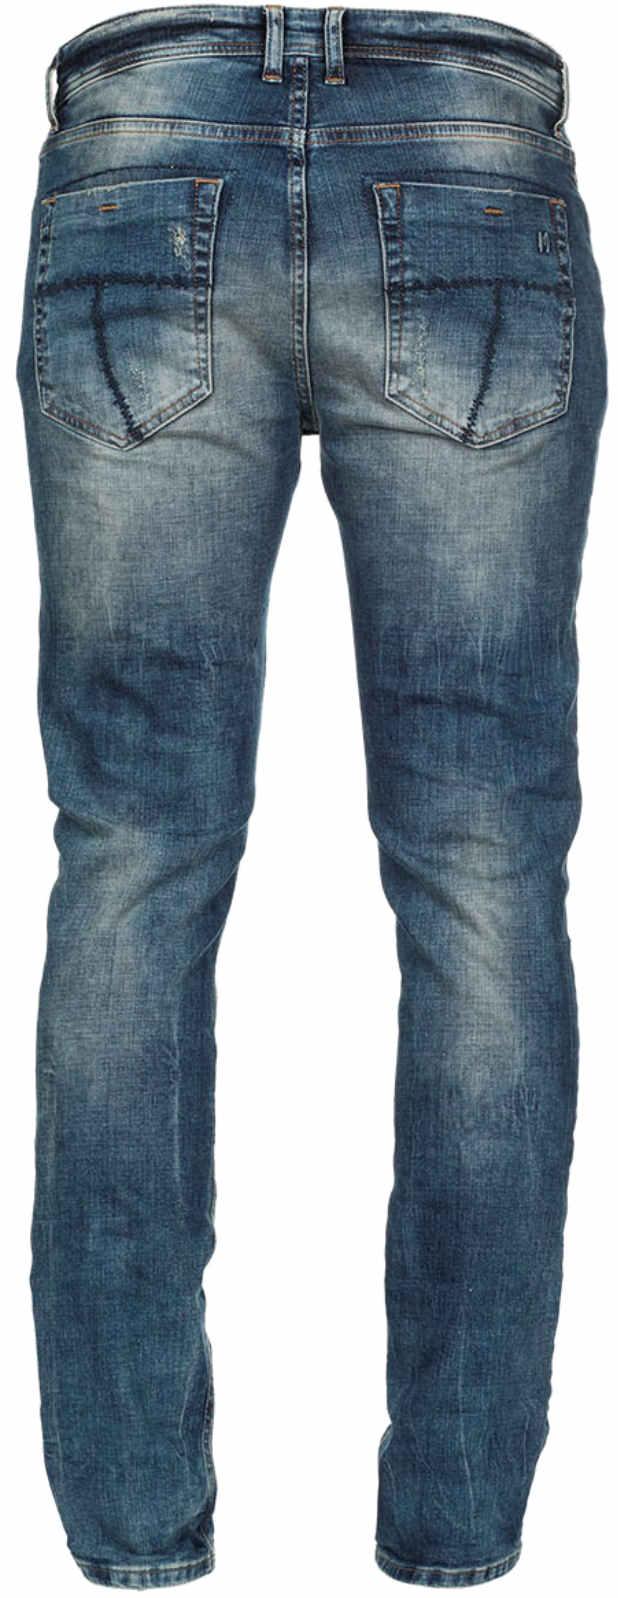 M-O-D-Herren-Jeans-Cornell-Slim-NOS-1003-Hose-Stretch-NEU-Slim-Fit-Leg-Denim-MOD Indexbild 3